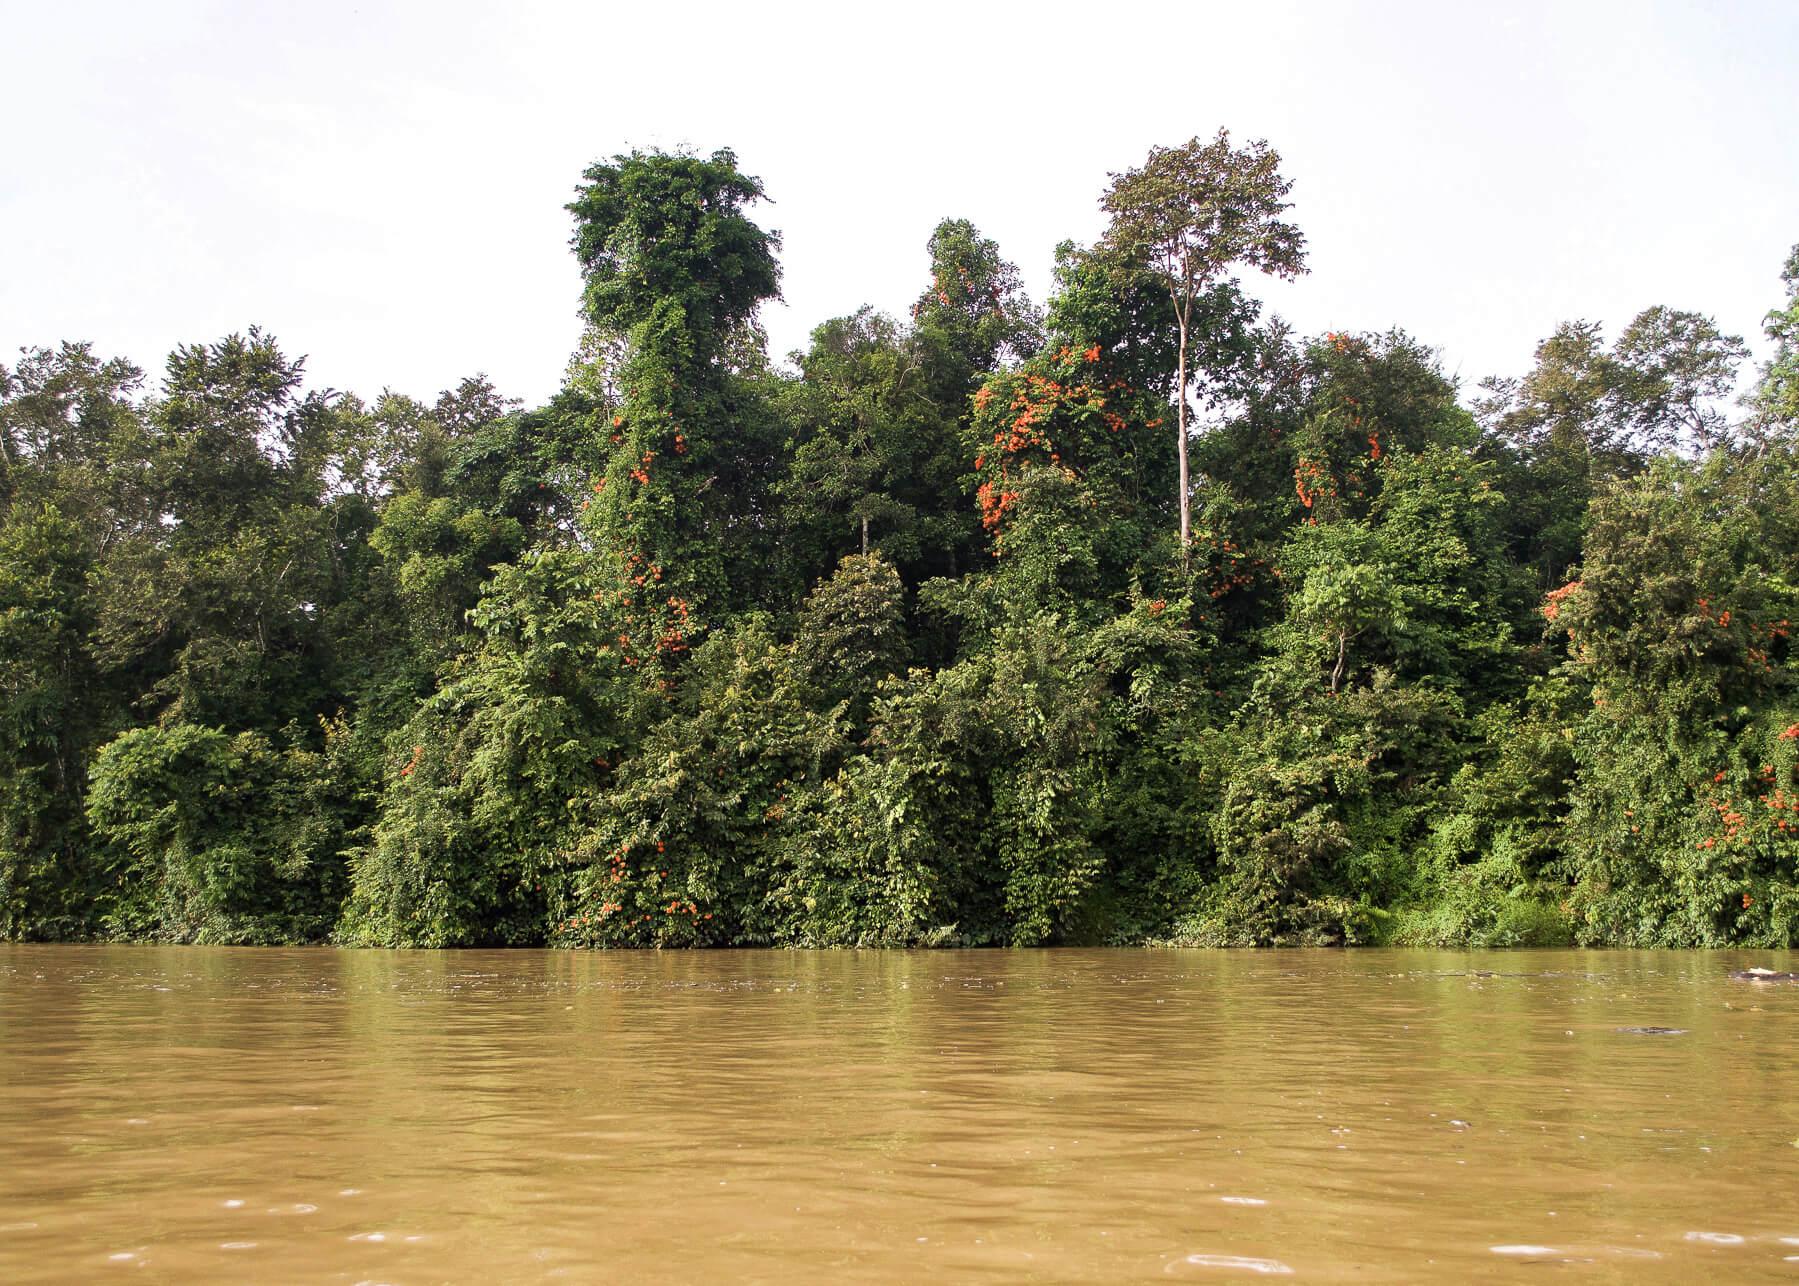 Kinabatangan river with luscious greenery on the banks